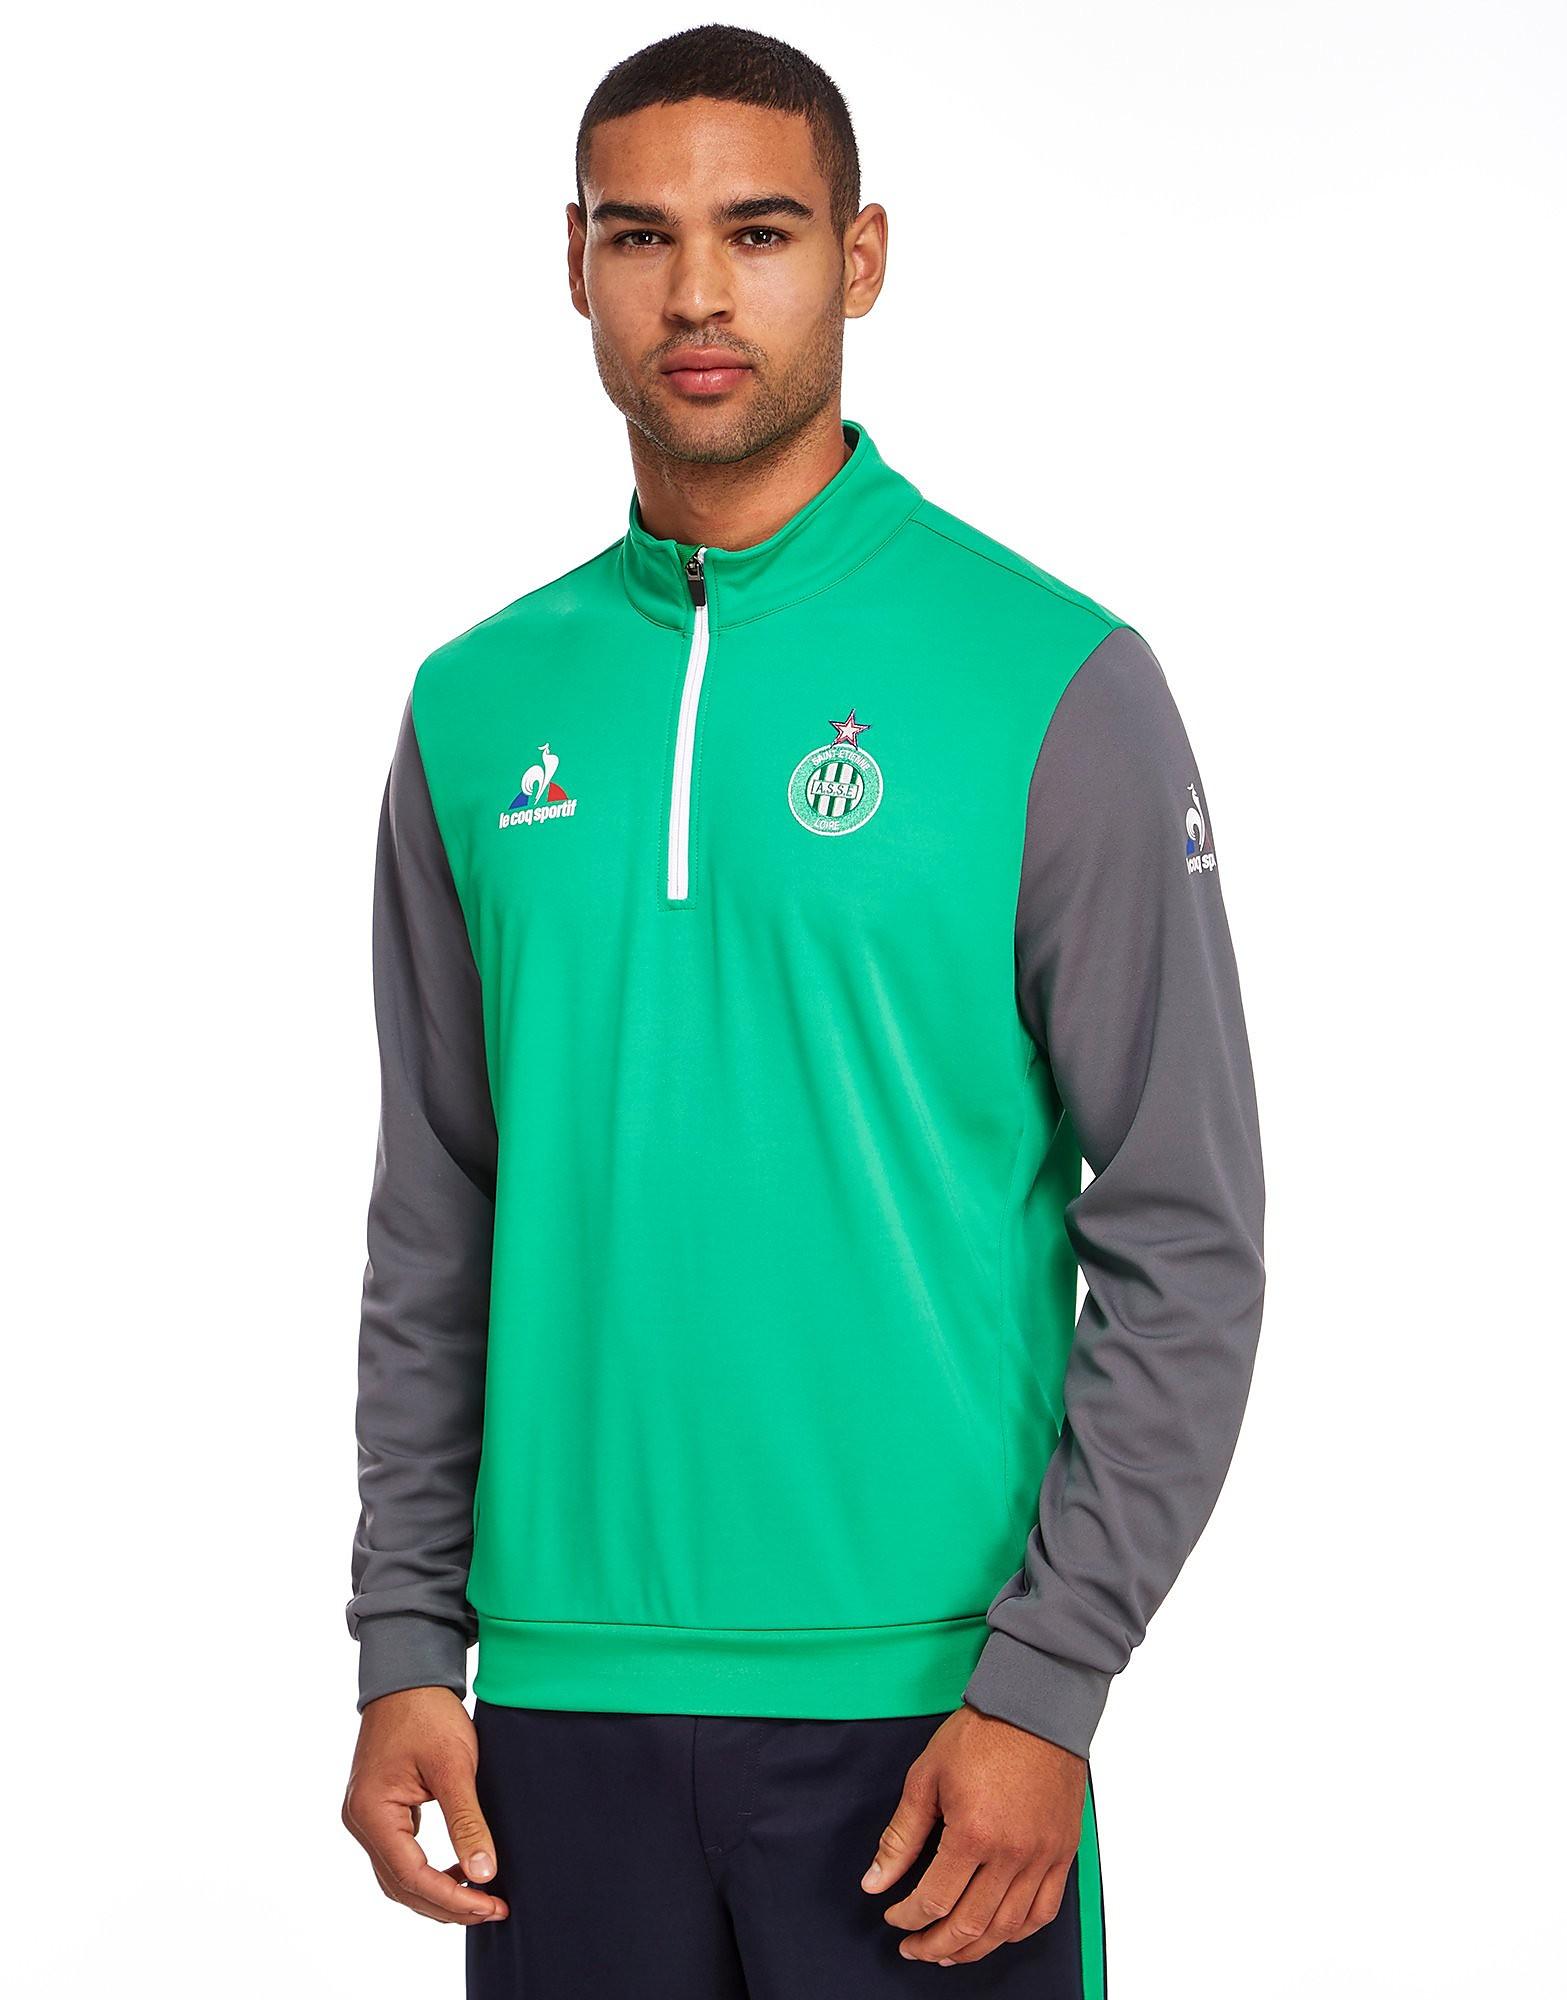 Le Coq Sportif AS Saint Etienne Half Zip Sweatshirt